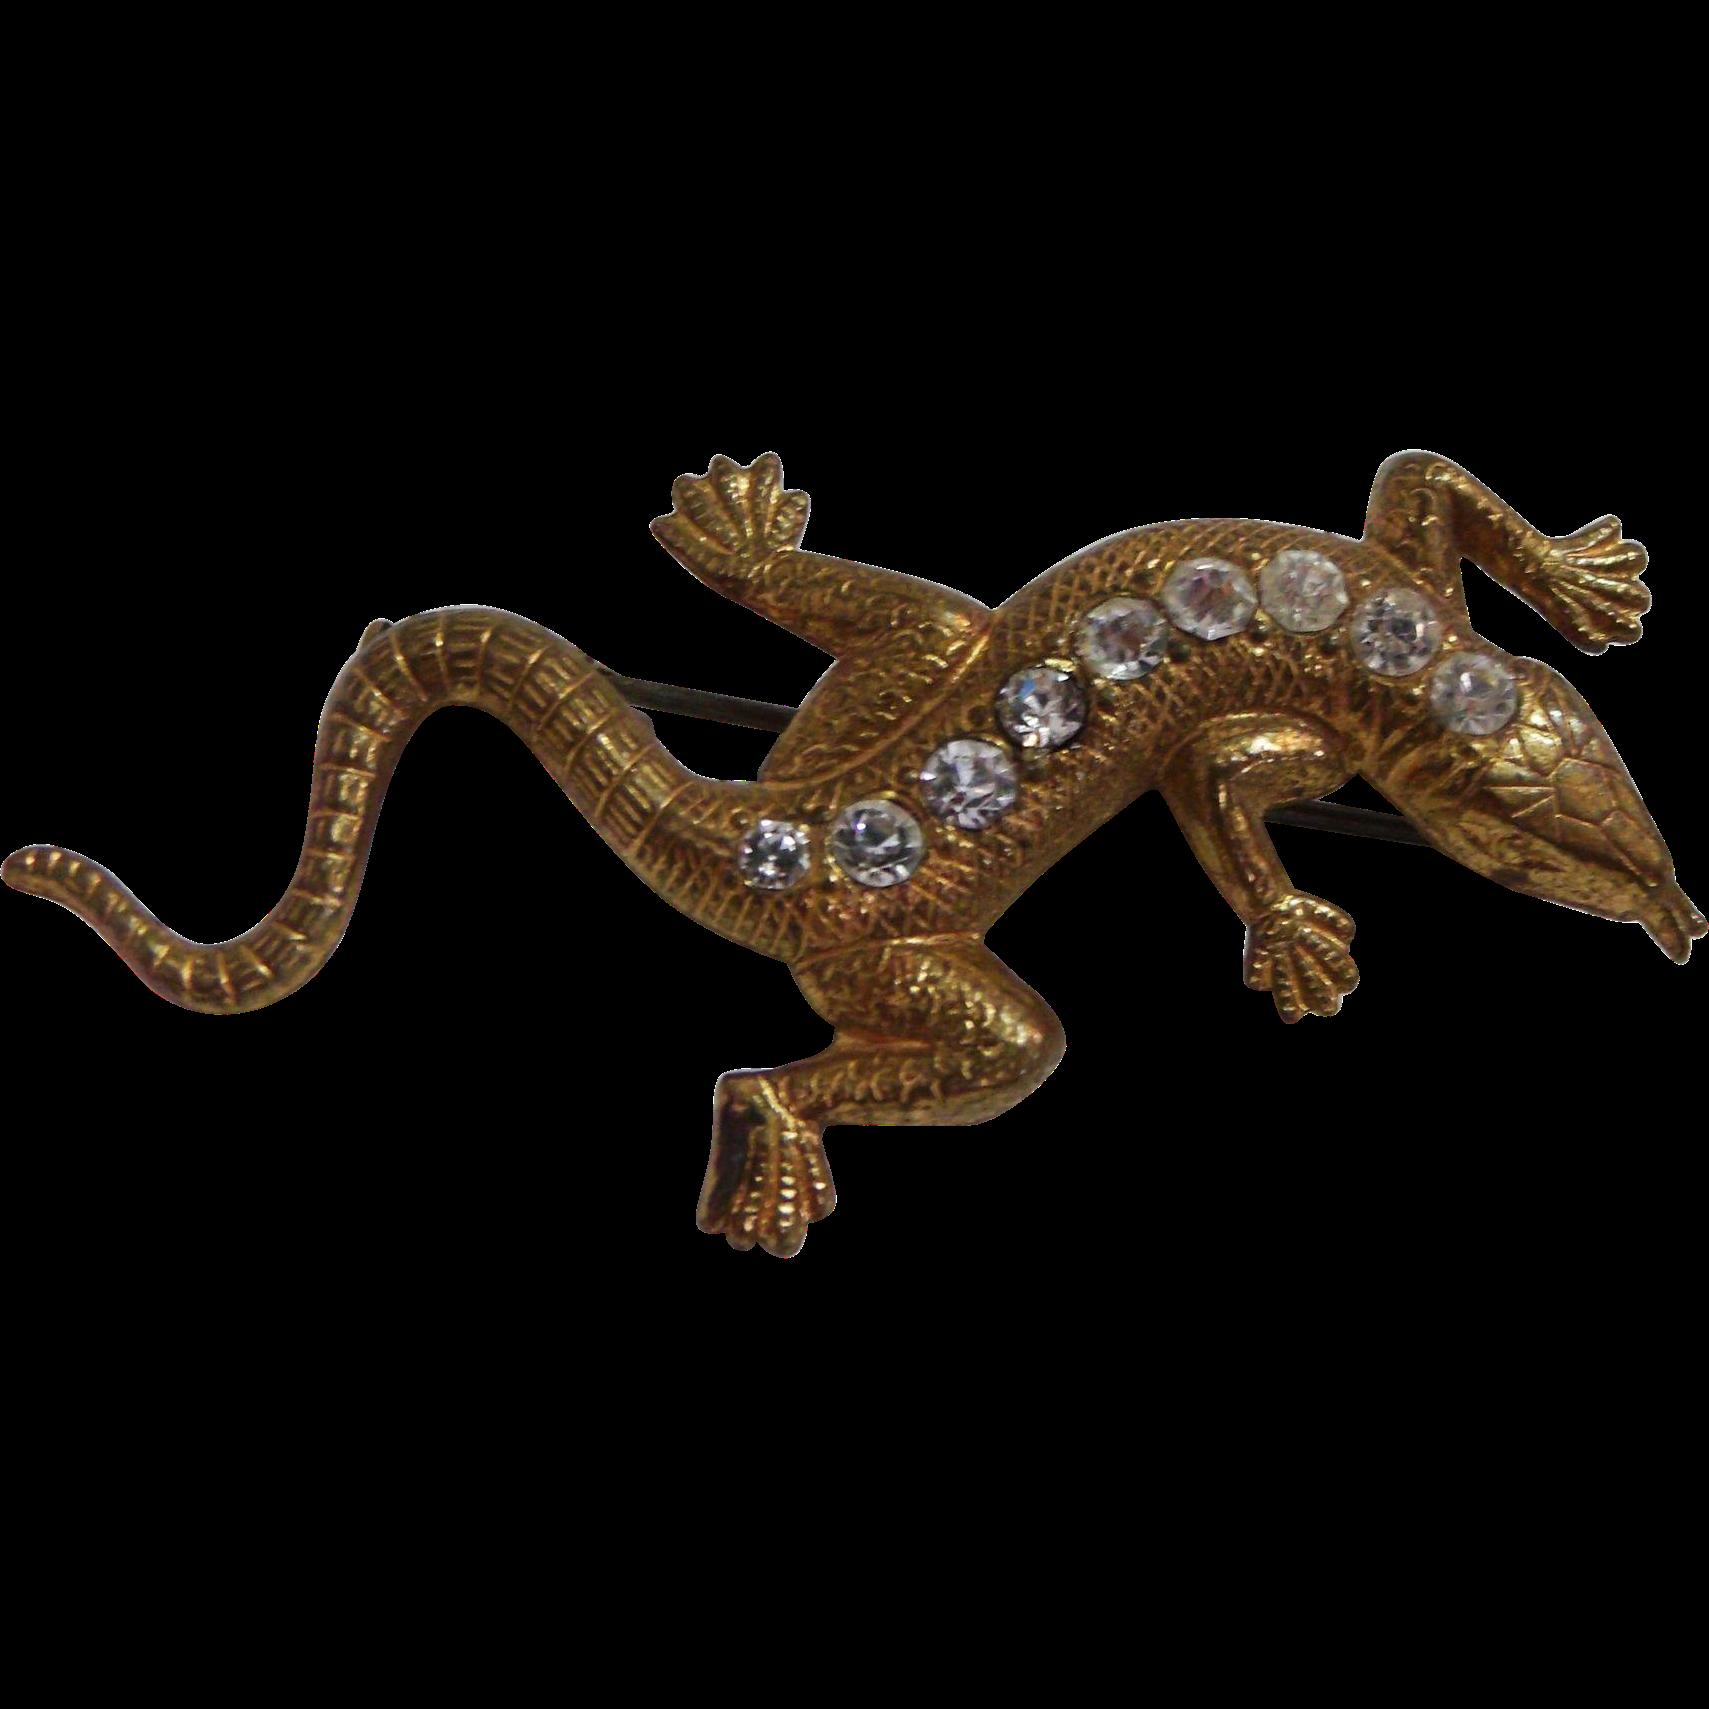 Vintage Gold tone Lizard Pin w/ Rhinestones Trombone clasp